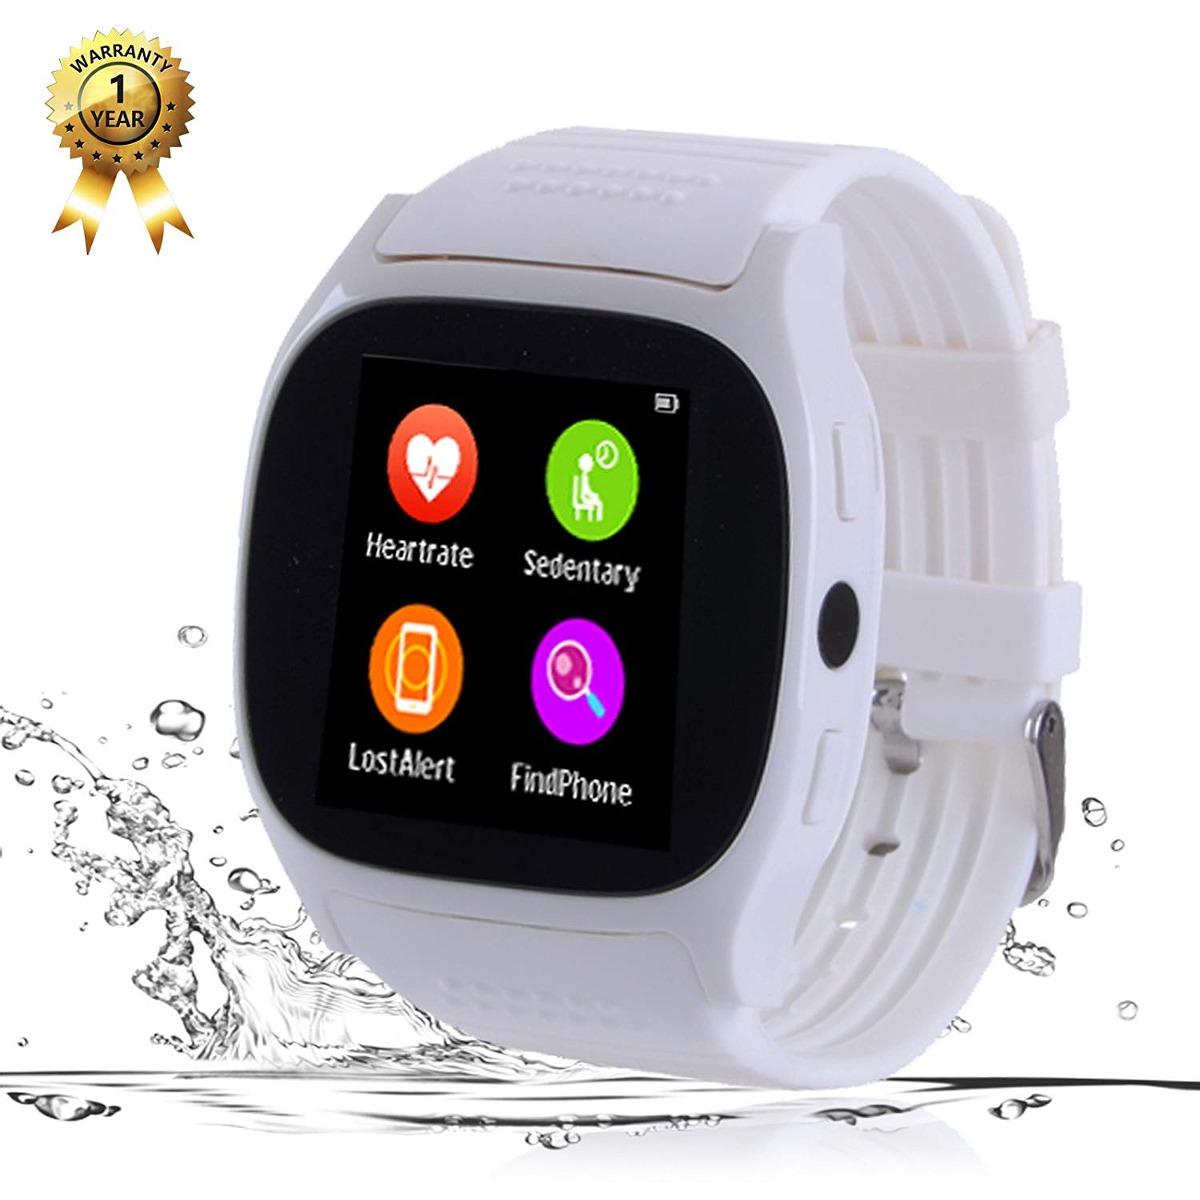 824e57ffc inteligente reloj teléfono reloj bluetooth smartwatch aptit. Cargando zoom.